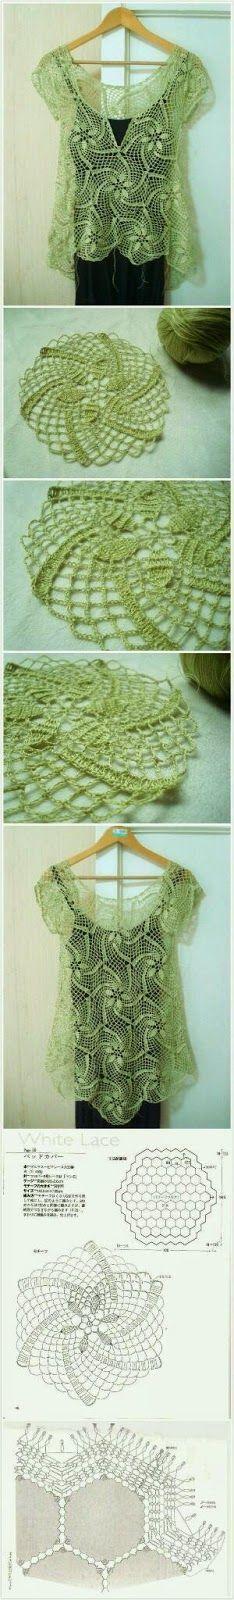 [] #<br/> # #Crochet #Tops,<br/> # #Saints,<br/> # #Cristina,<br/> # #Bolero,<br/> # #Dress,<br/> # #Crochet #Ideas,<br/> # #Blog,<br/> # #Crafts,<br/> # #Blusas #Tejidas<br/>